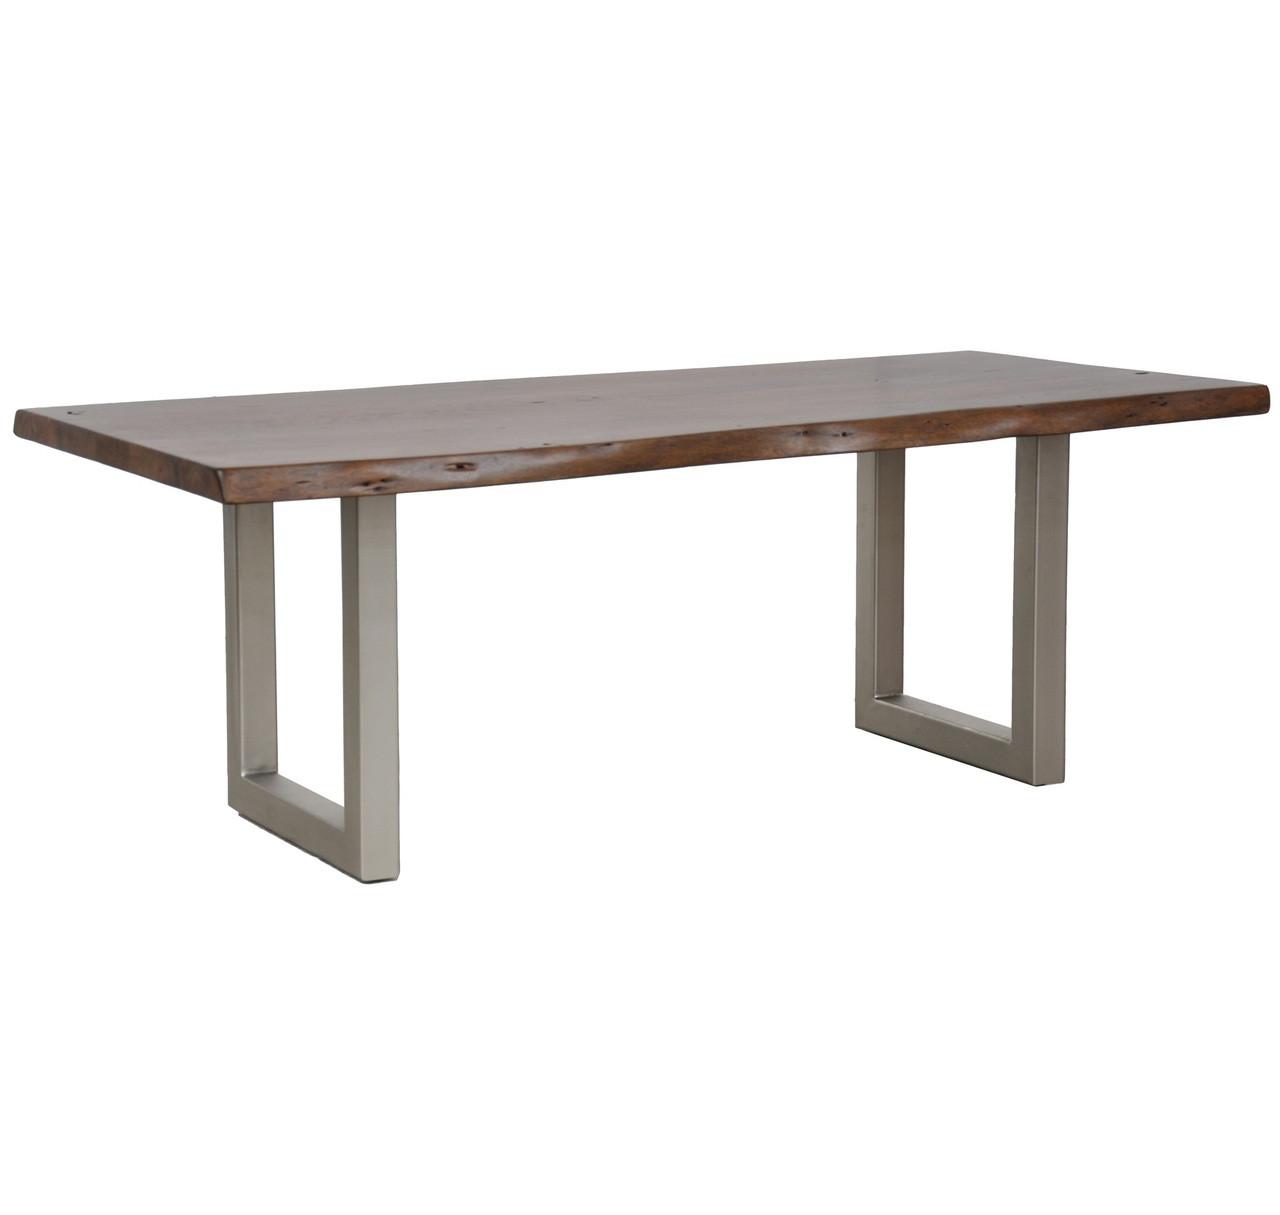 Montana Solid Wood Metal Leg Dining Table 94quot Zin Home : MontanaSolidWoodMetalLegDiningTable82646501415080598 from www.zinhome.com size 1280 x 1215 jpeg 61kB